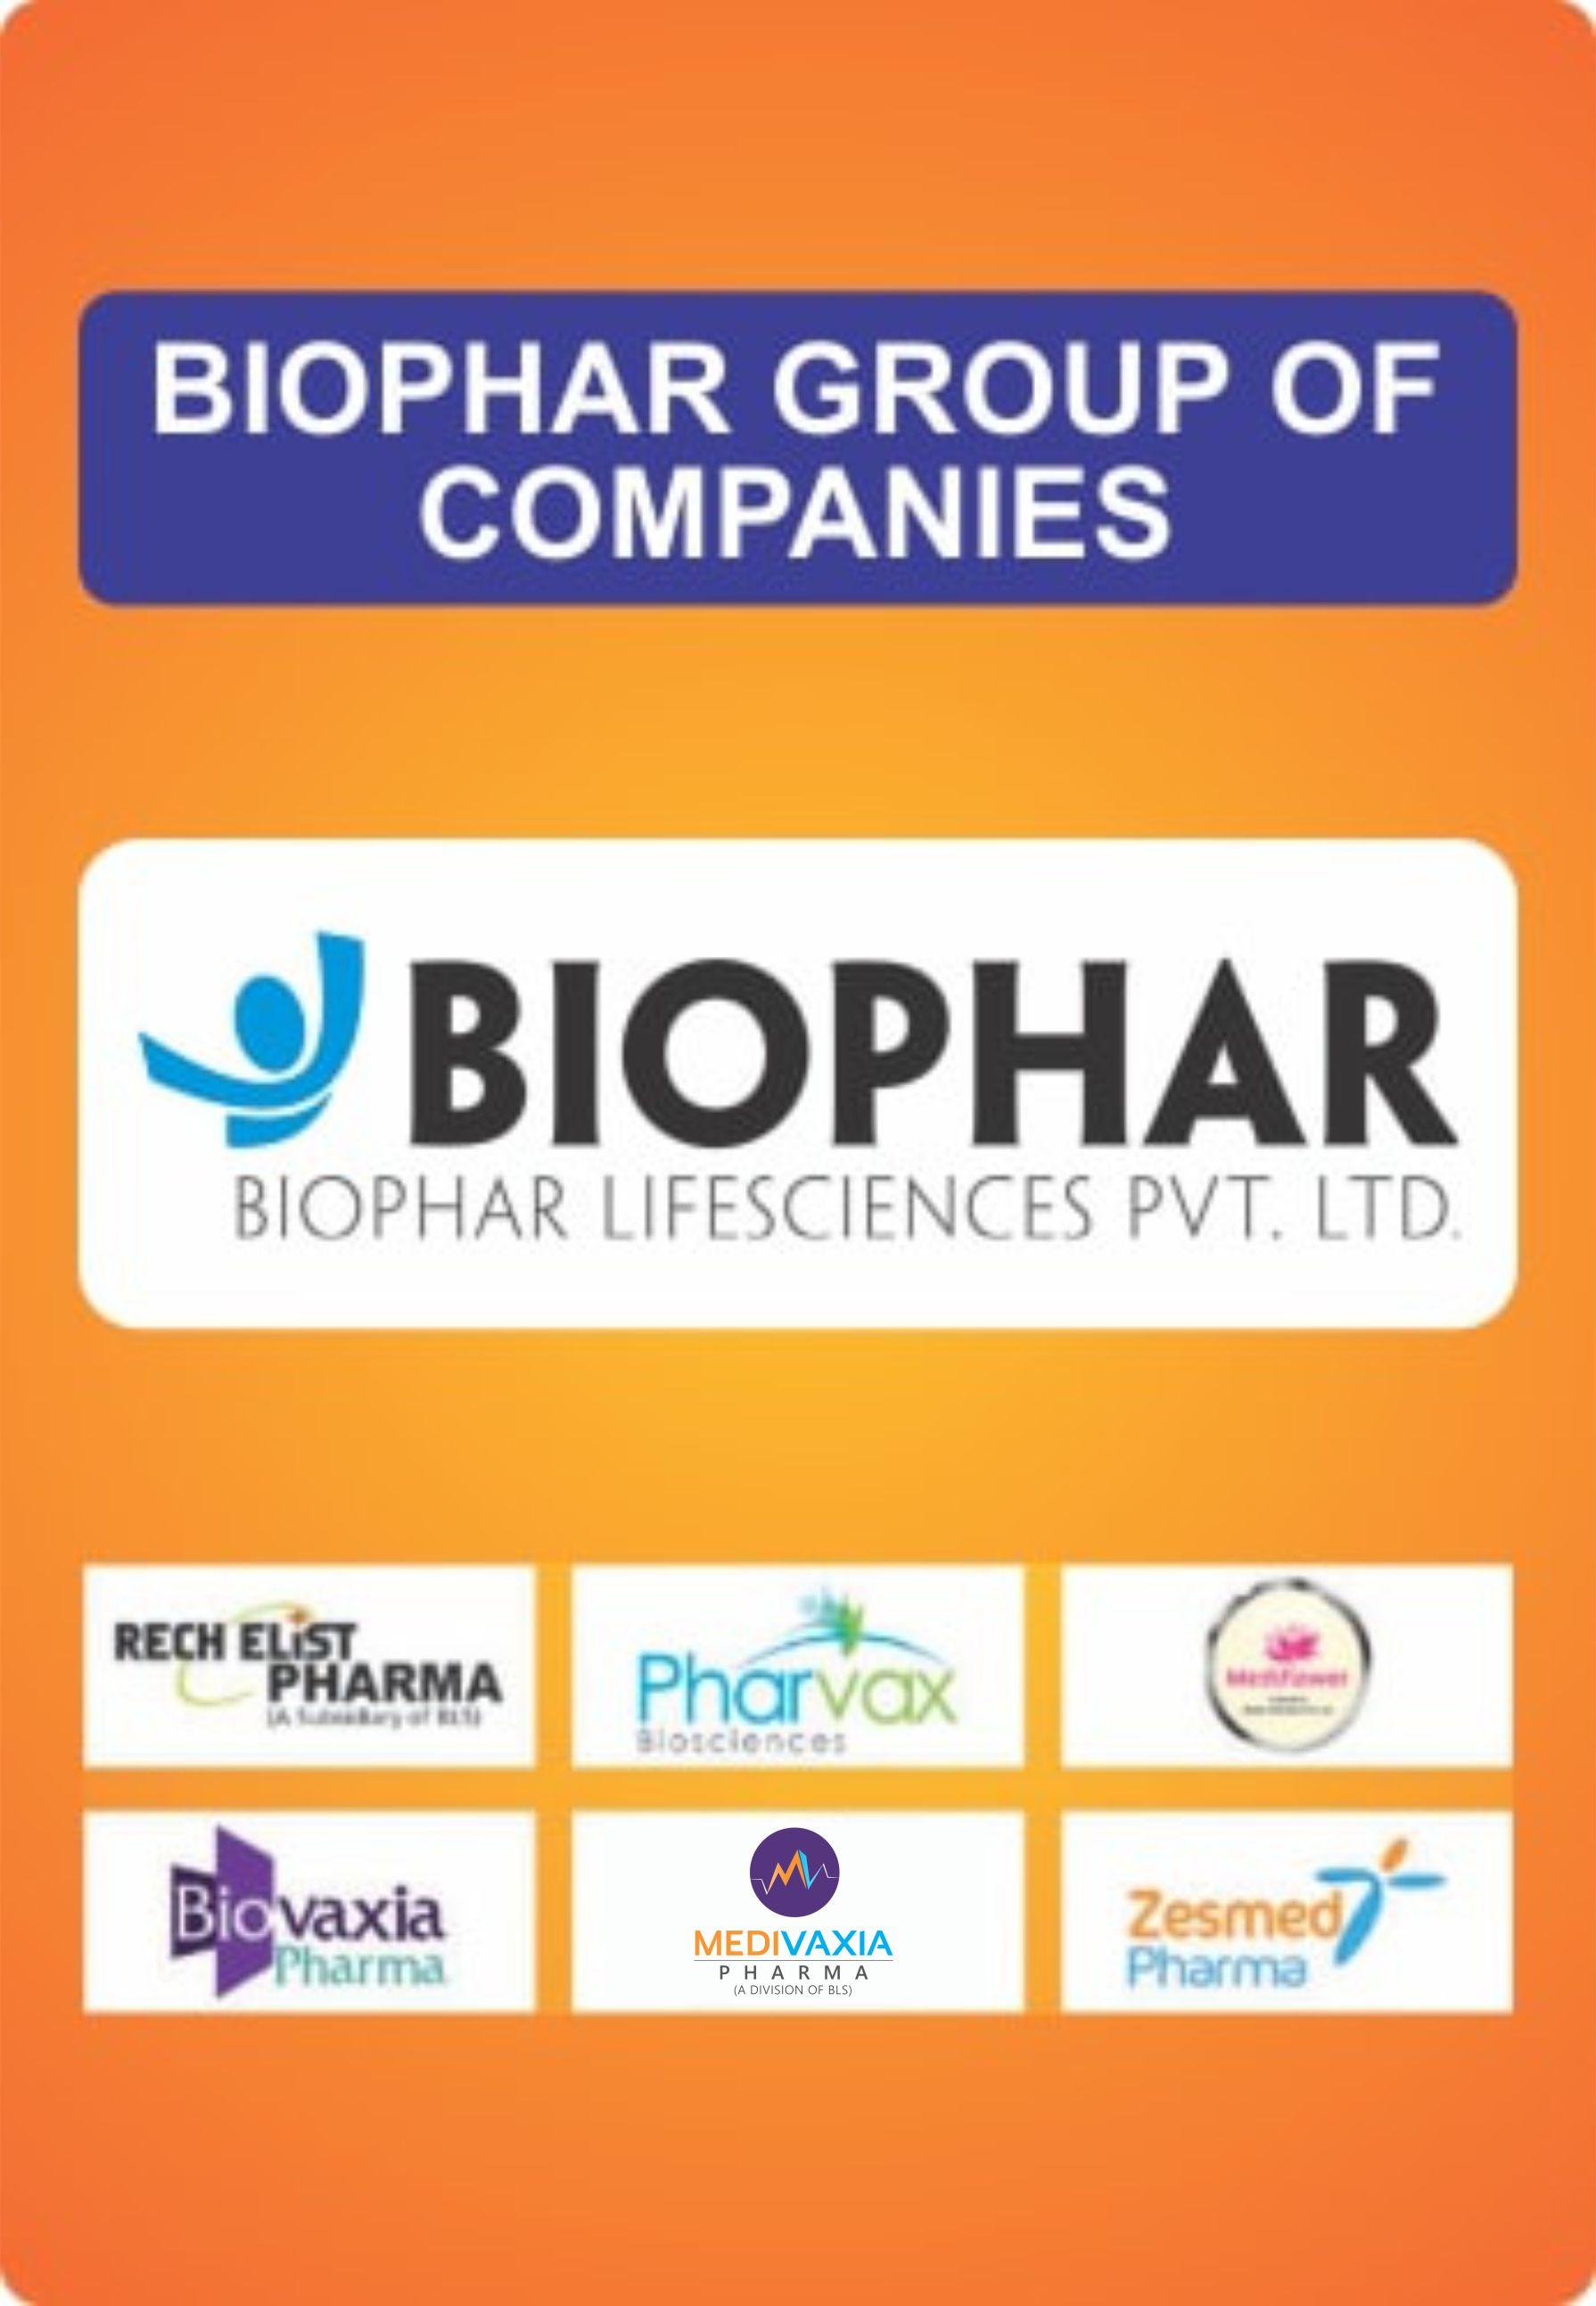 biophar-divsions